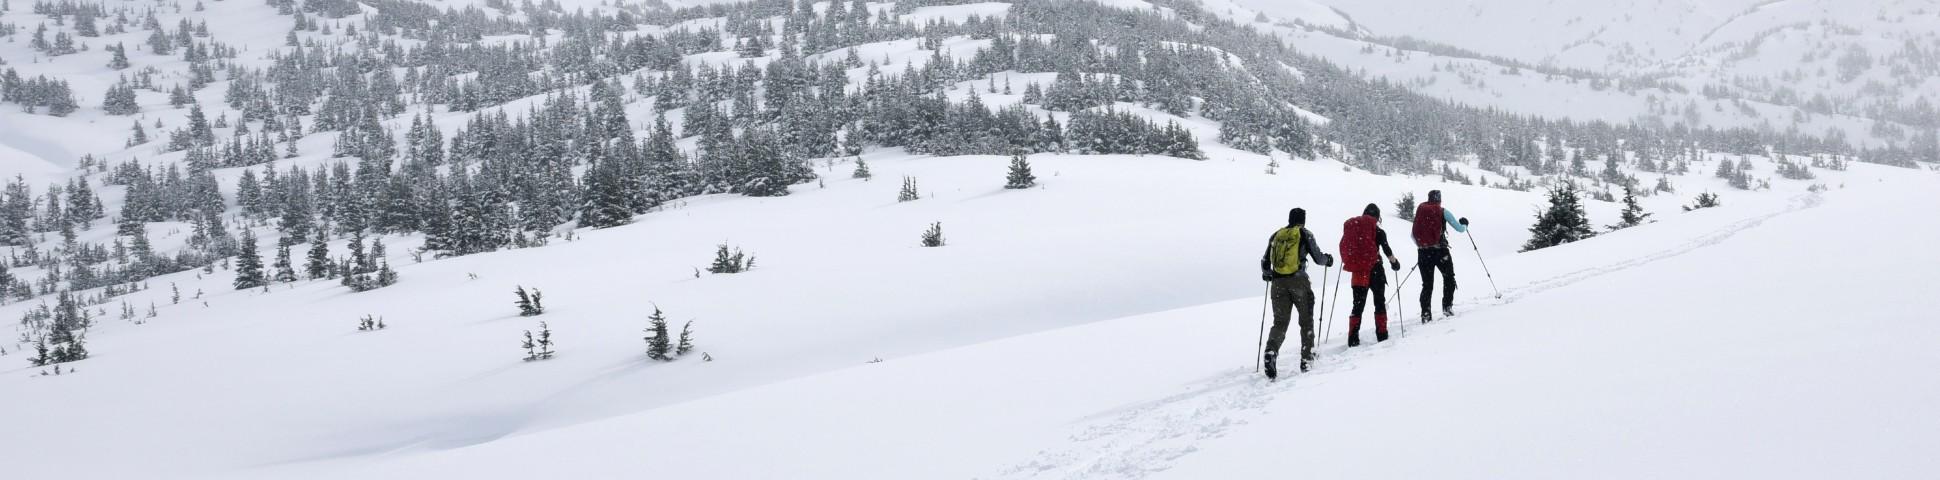 Three skiers skiing in snowed in backcountry